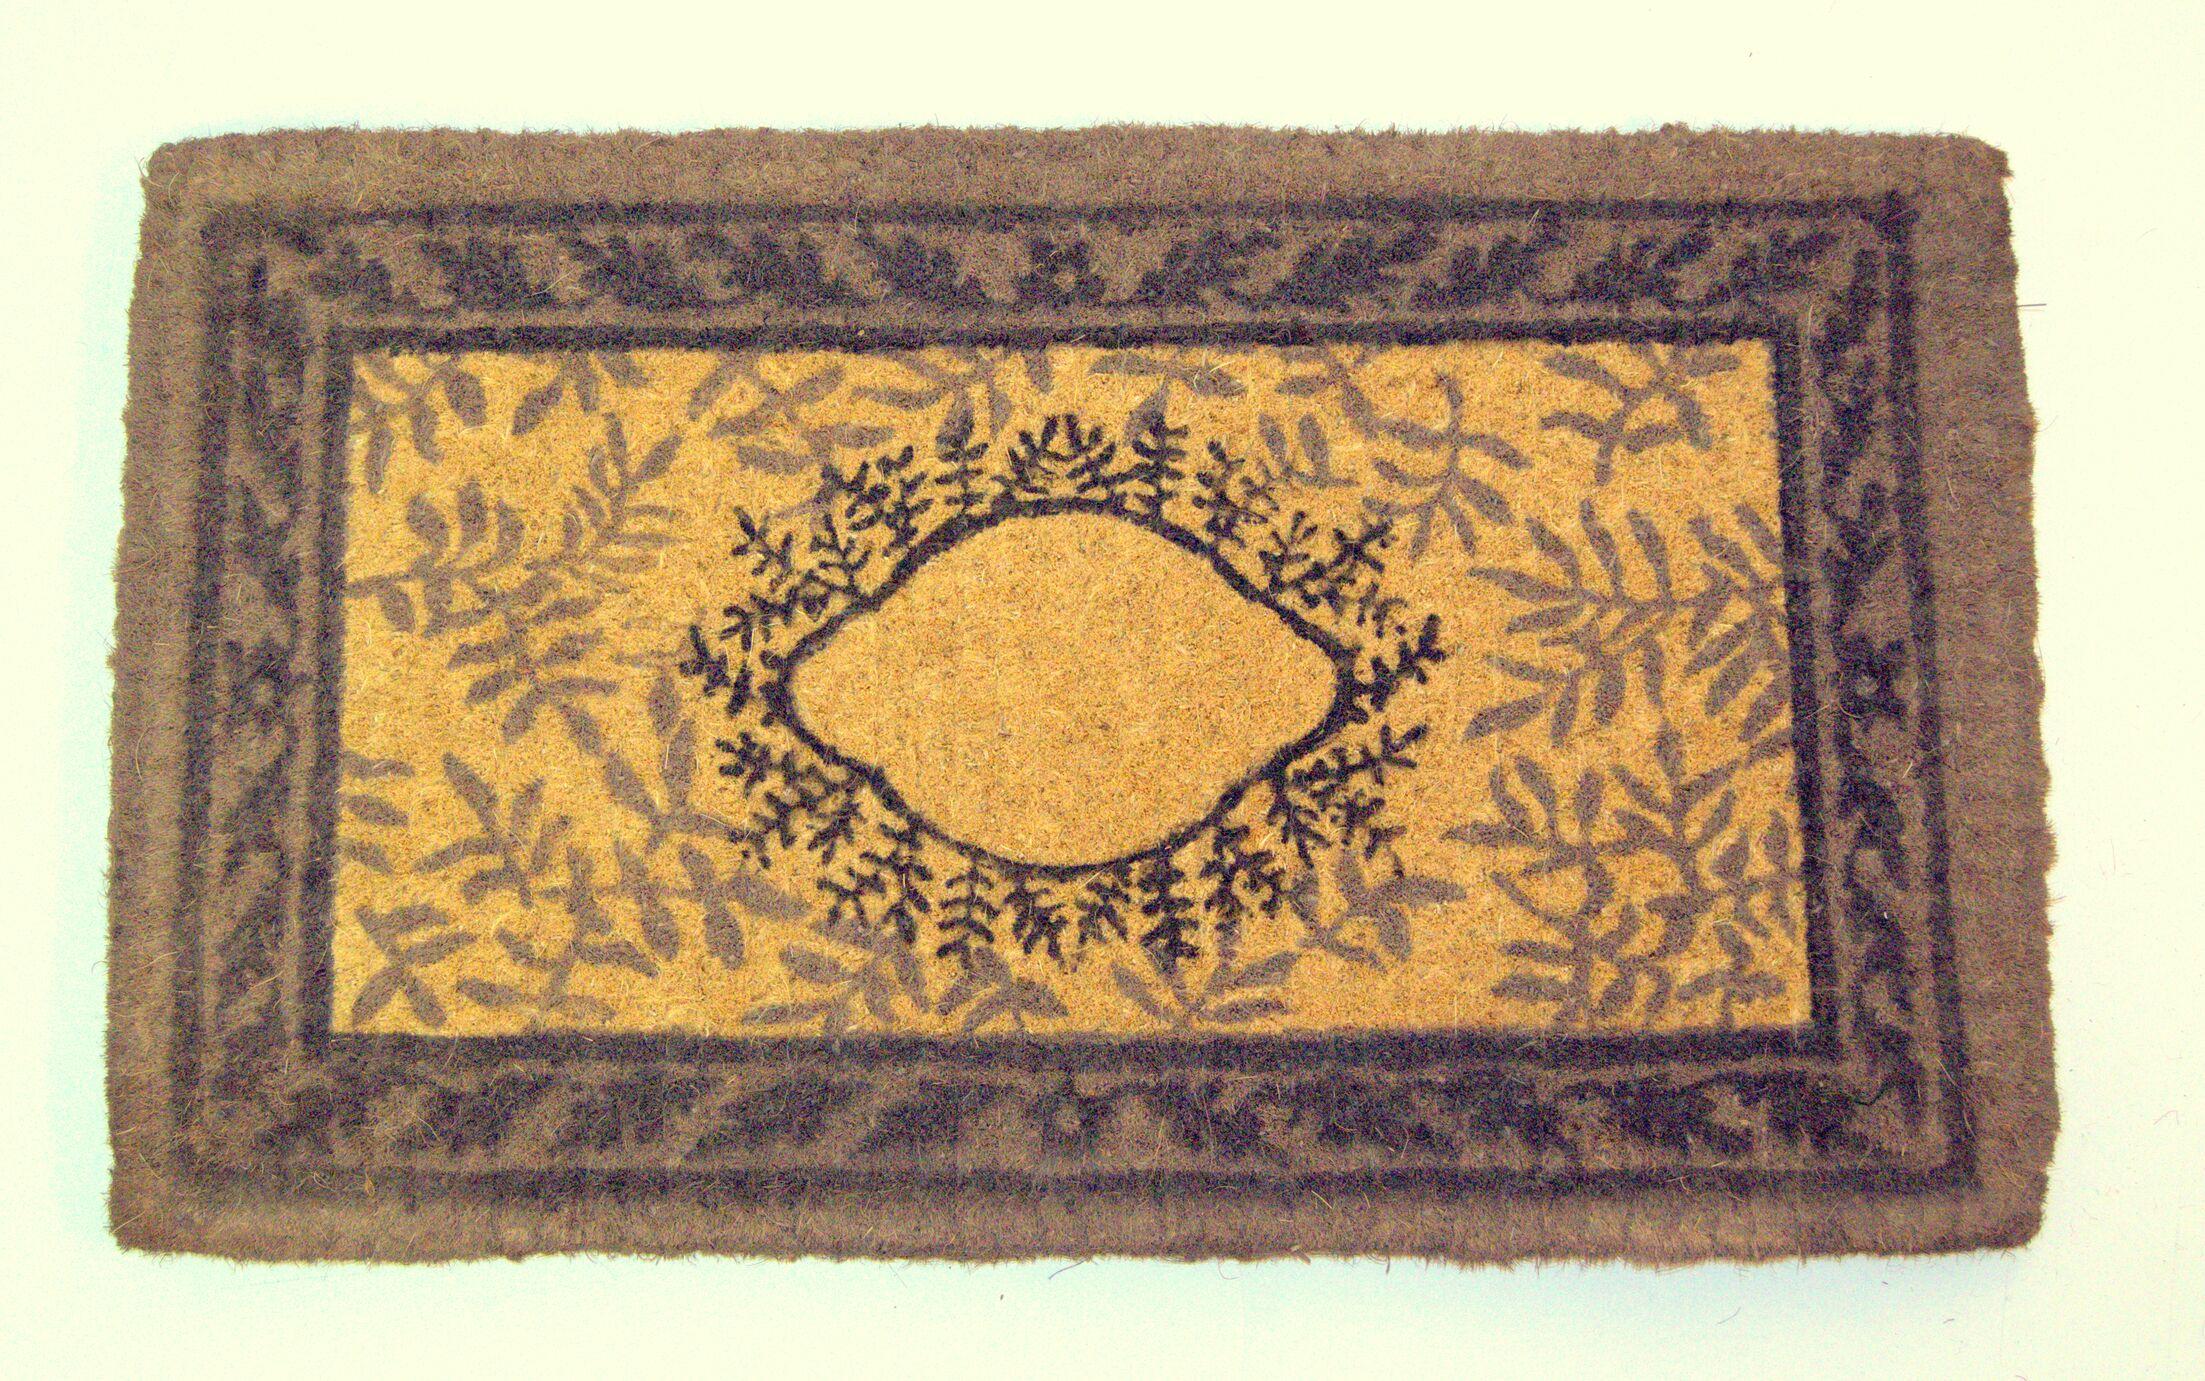 Haveman Leaf Doormat Mat Size: Rectangle 2'6